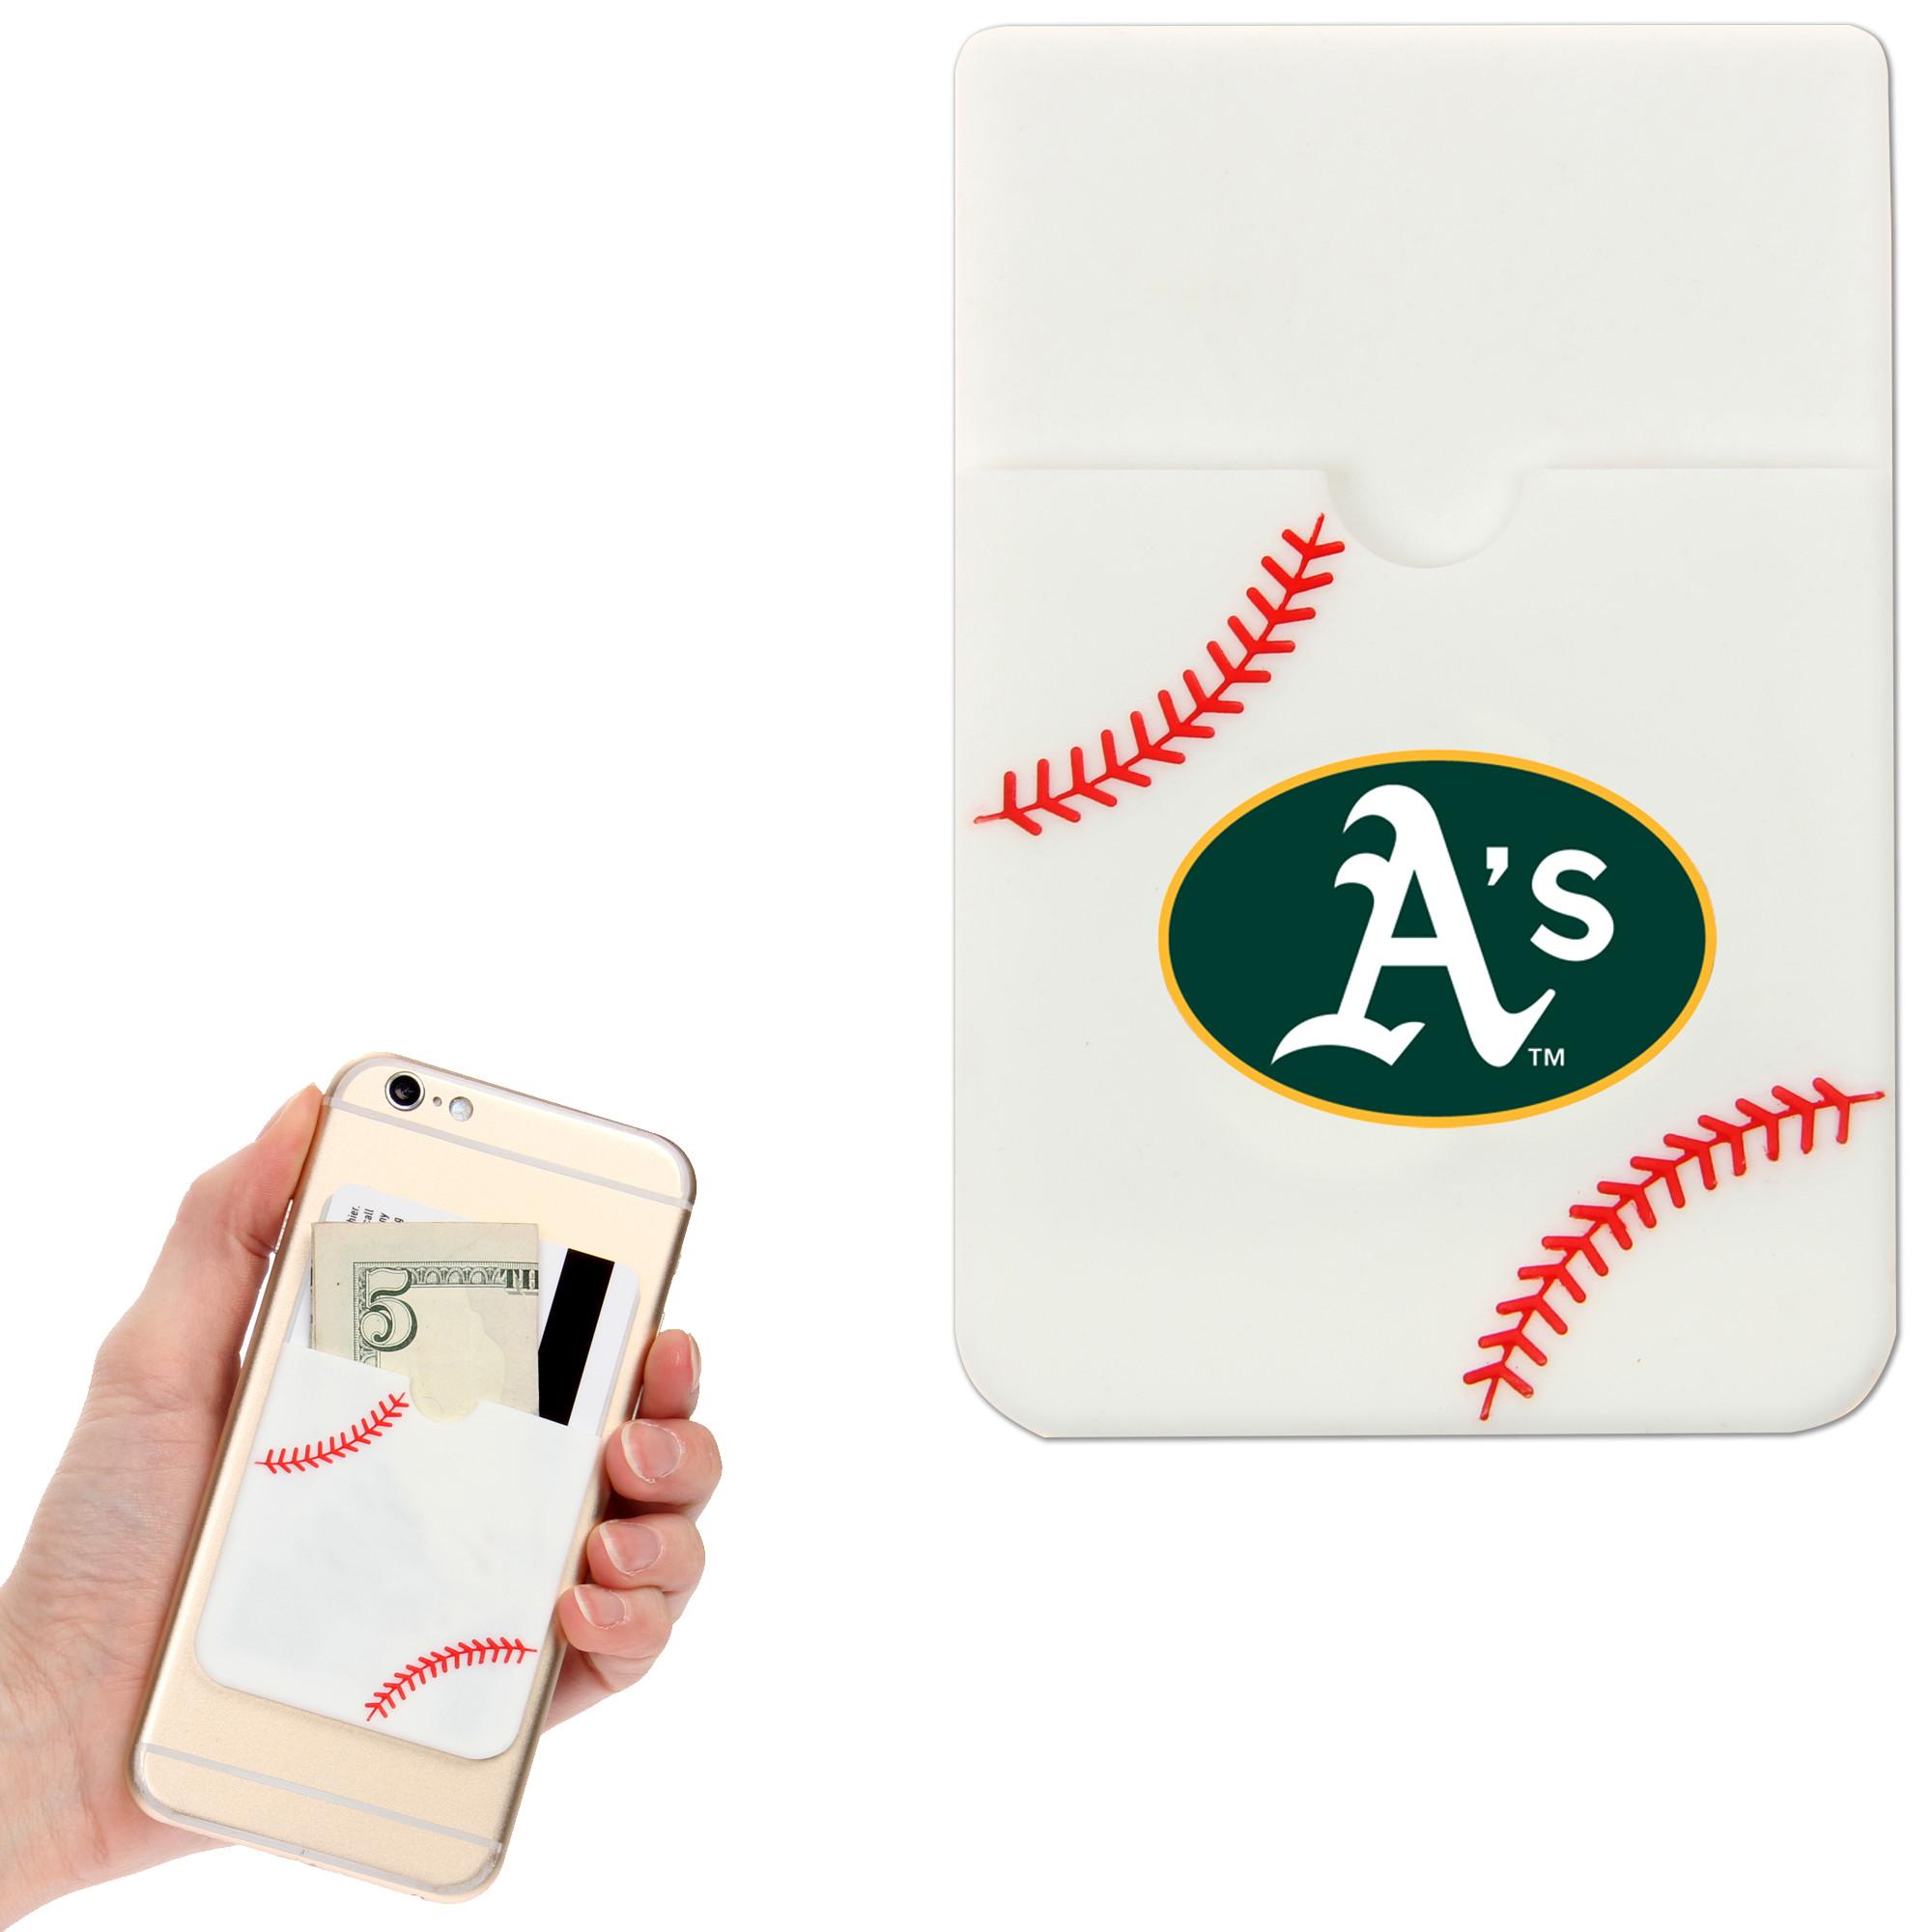 Oakland Athletics Baseball Sticker Wallet - White - No Size